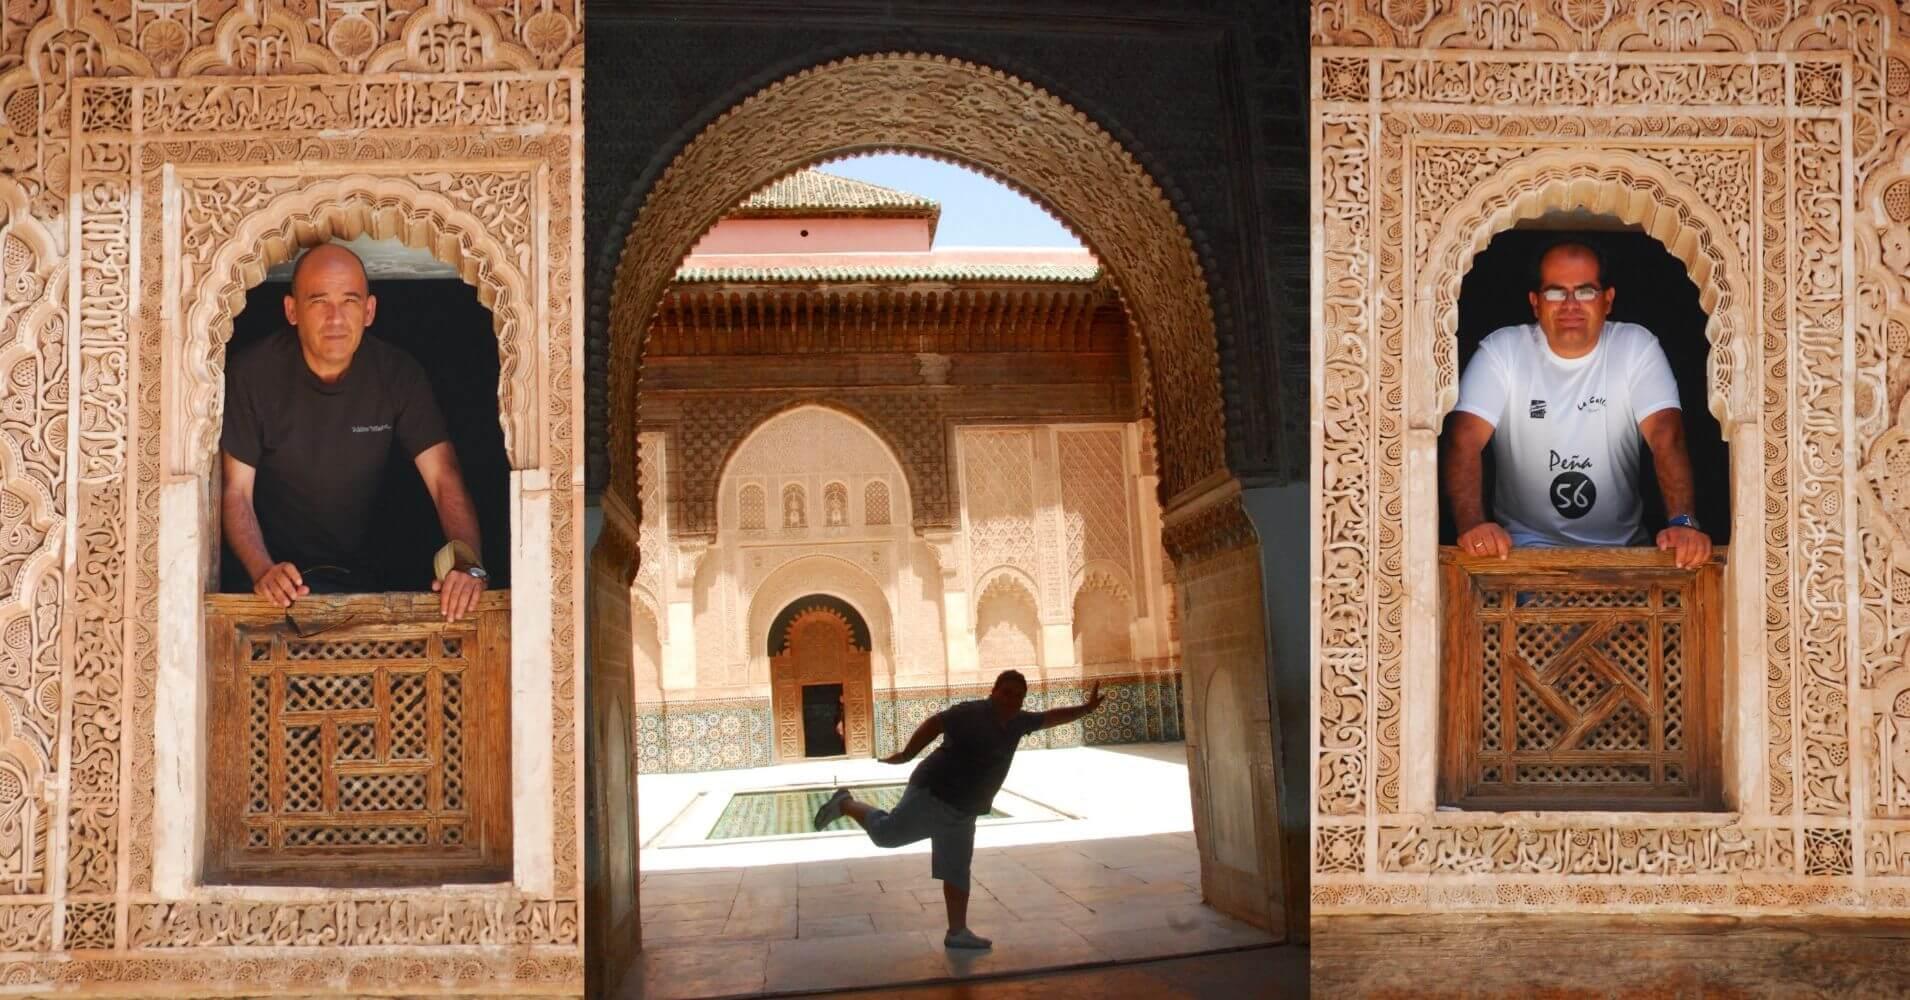 En la Madrasa de Ben Youssef. Marrakech. Marruecos.